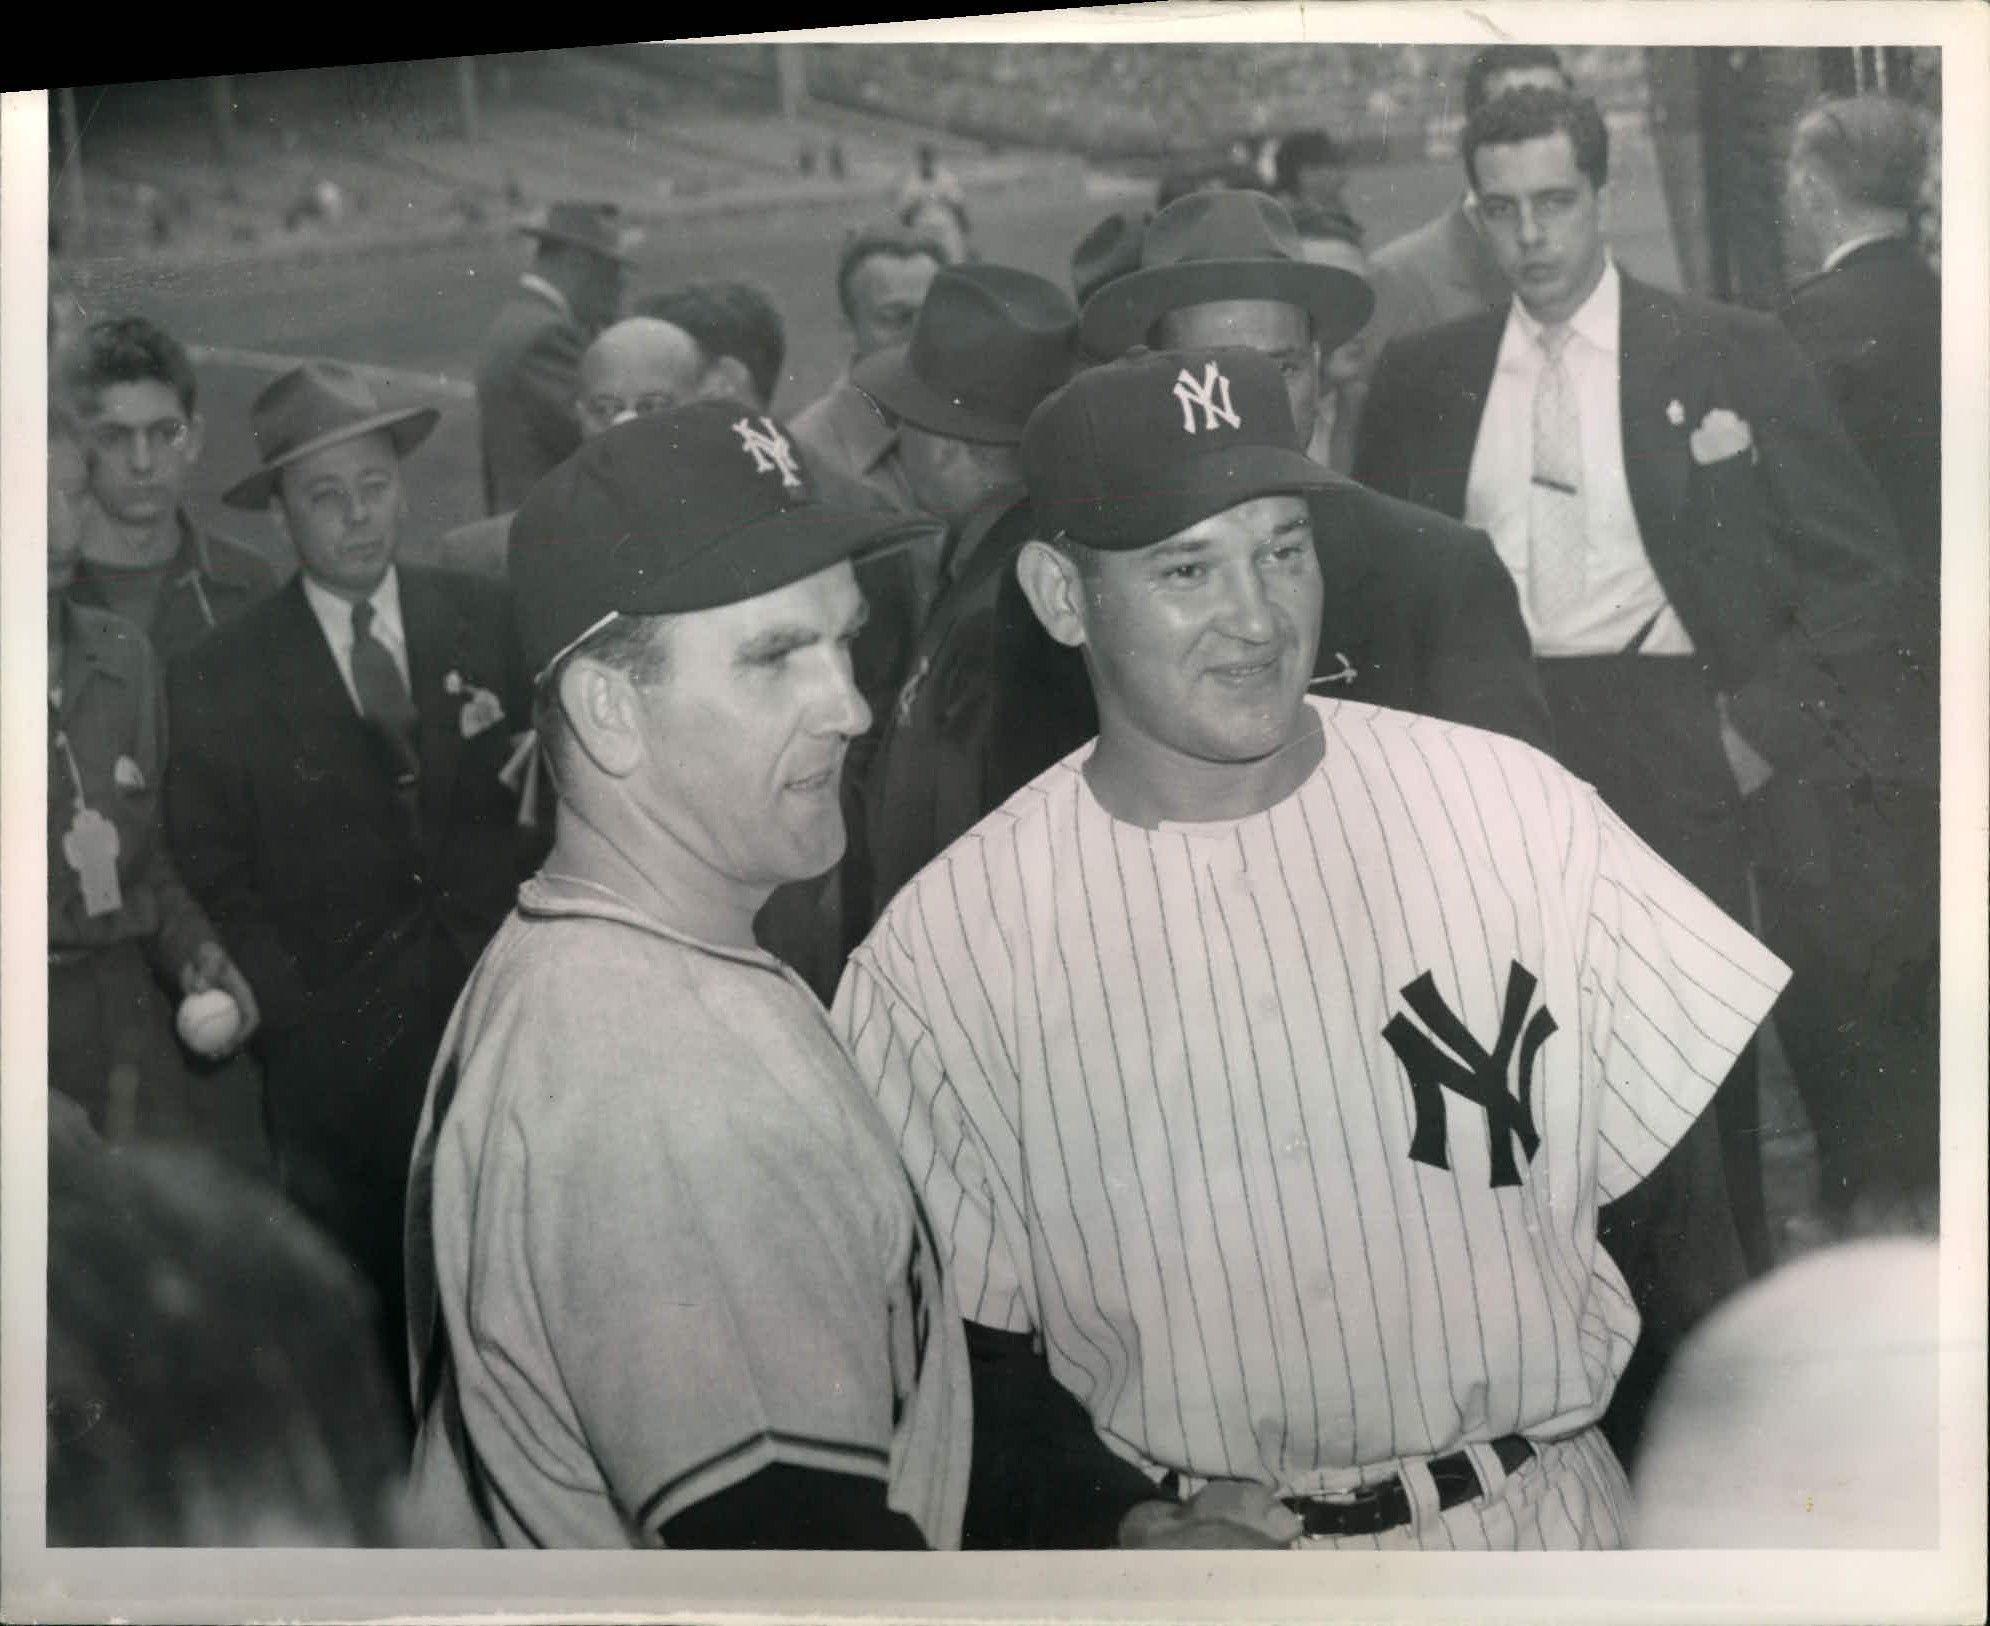 94cc9019168 Lot Detail - 1951 World Series New York Yankees New York Giants